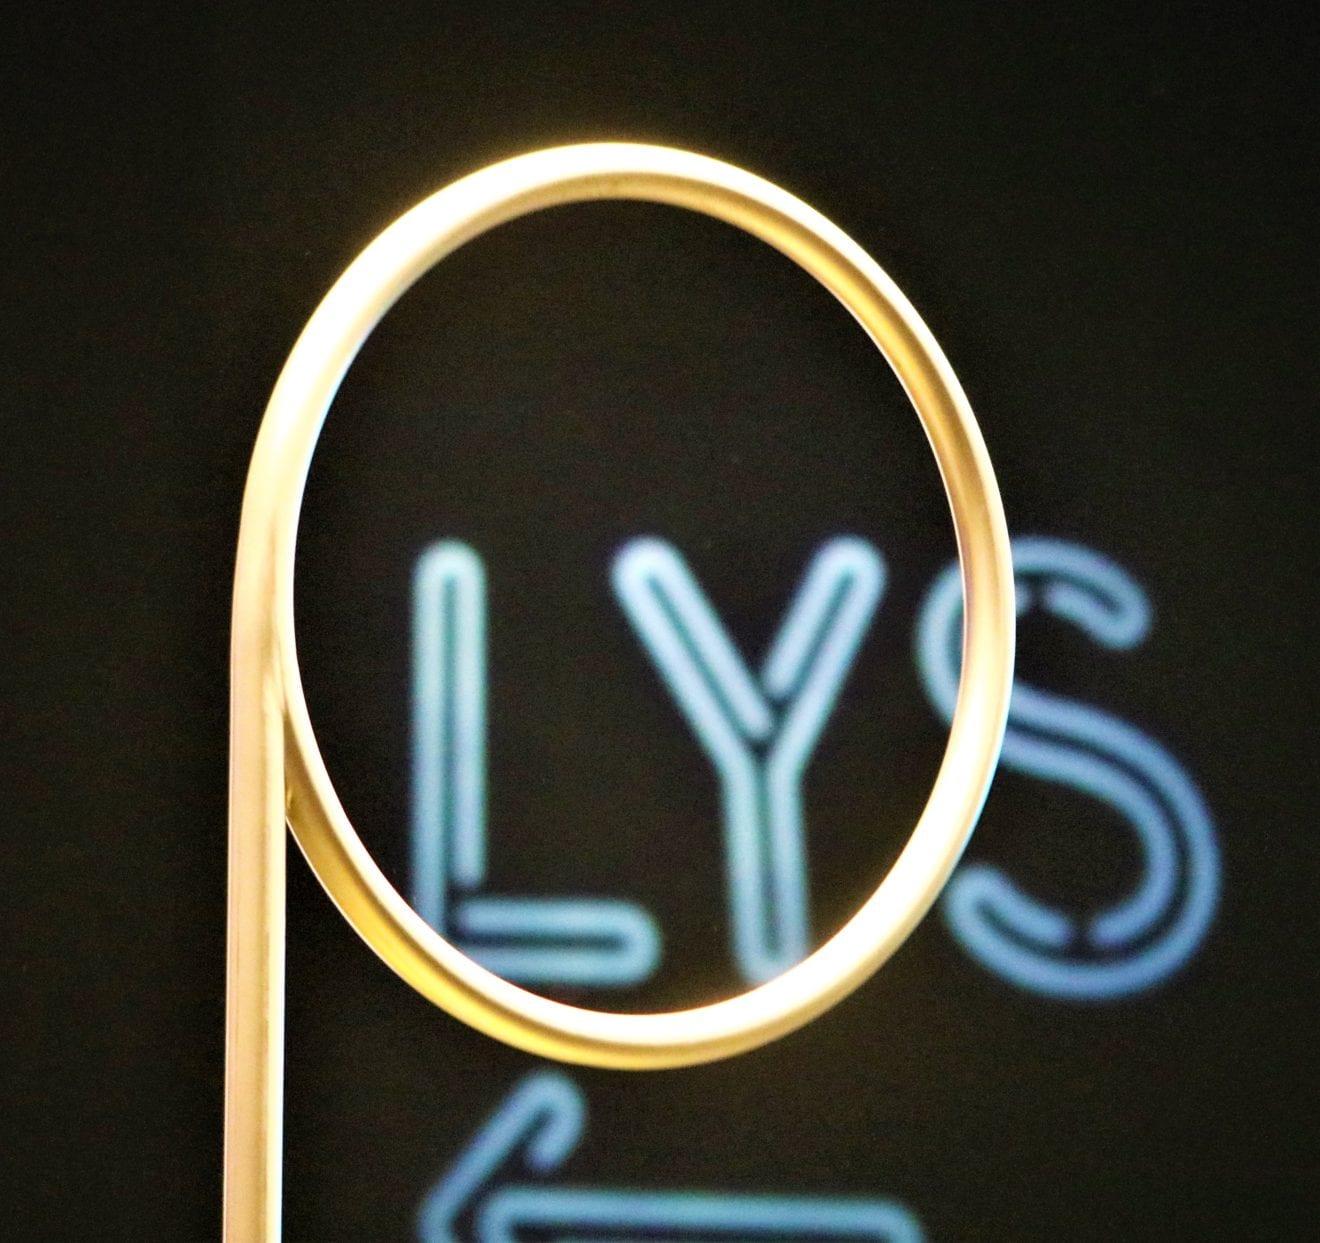 Lysfestival - 20. november